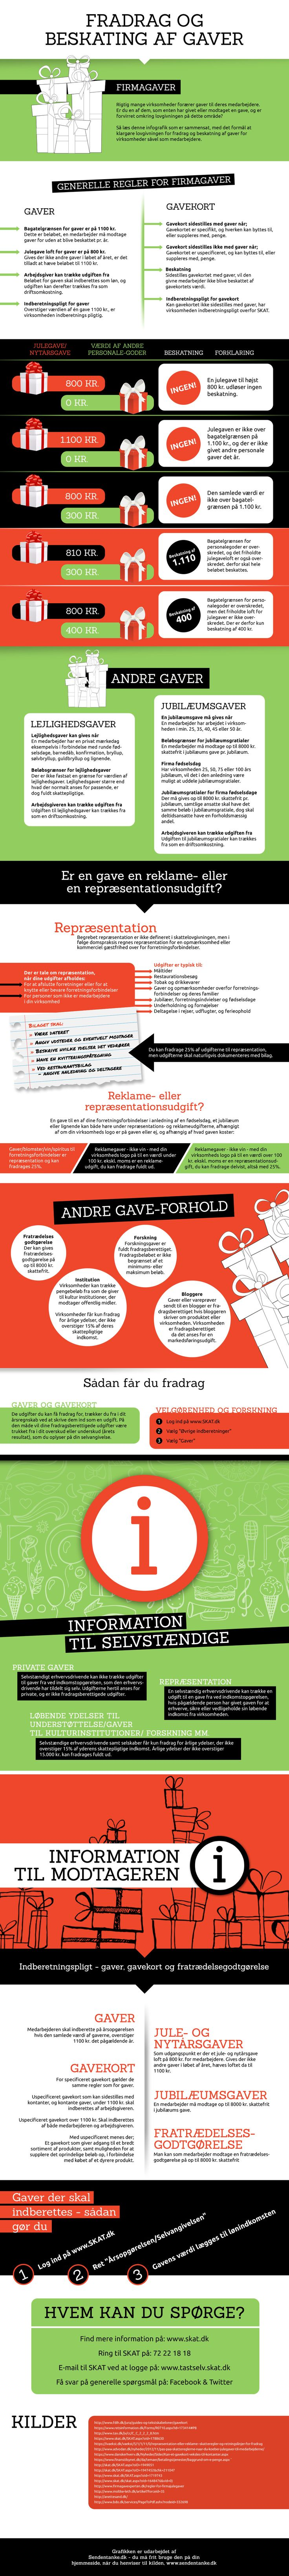 firmagaver-regler-gavekort-infografik